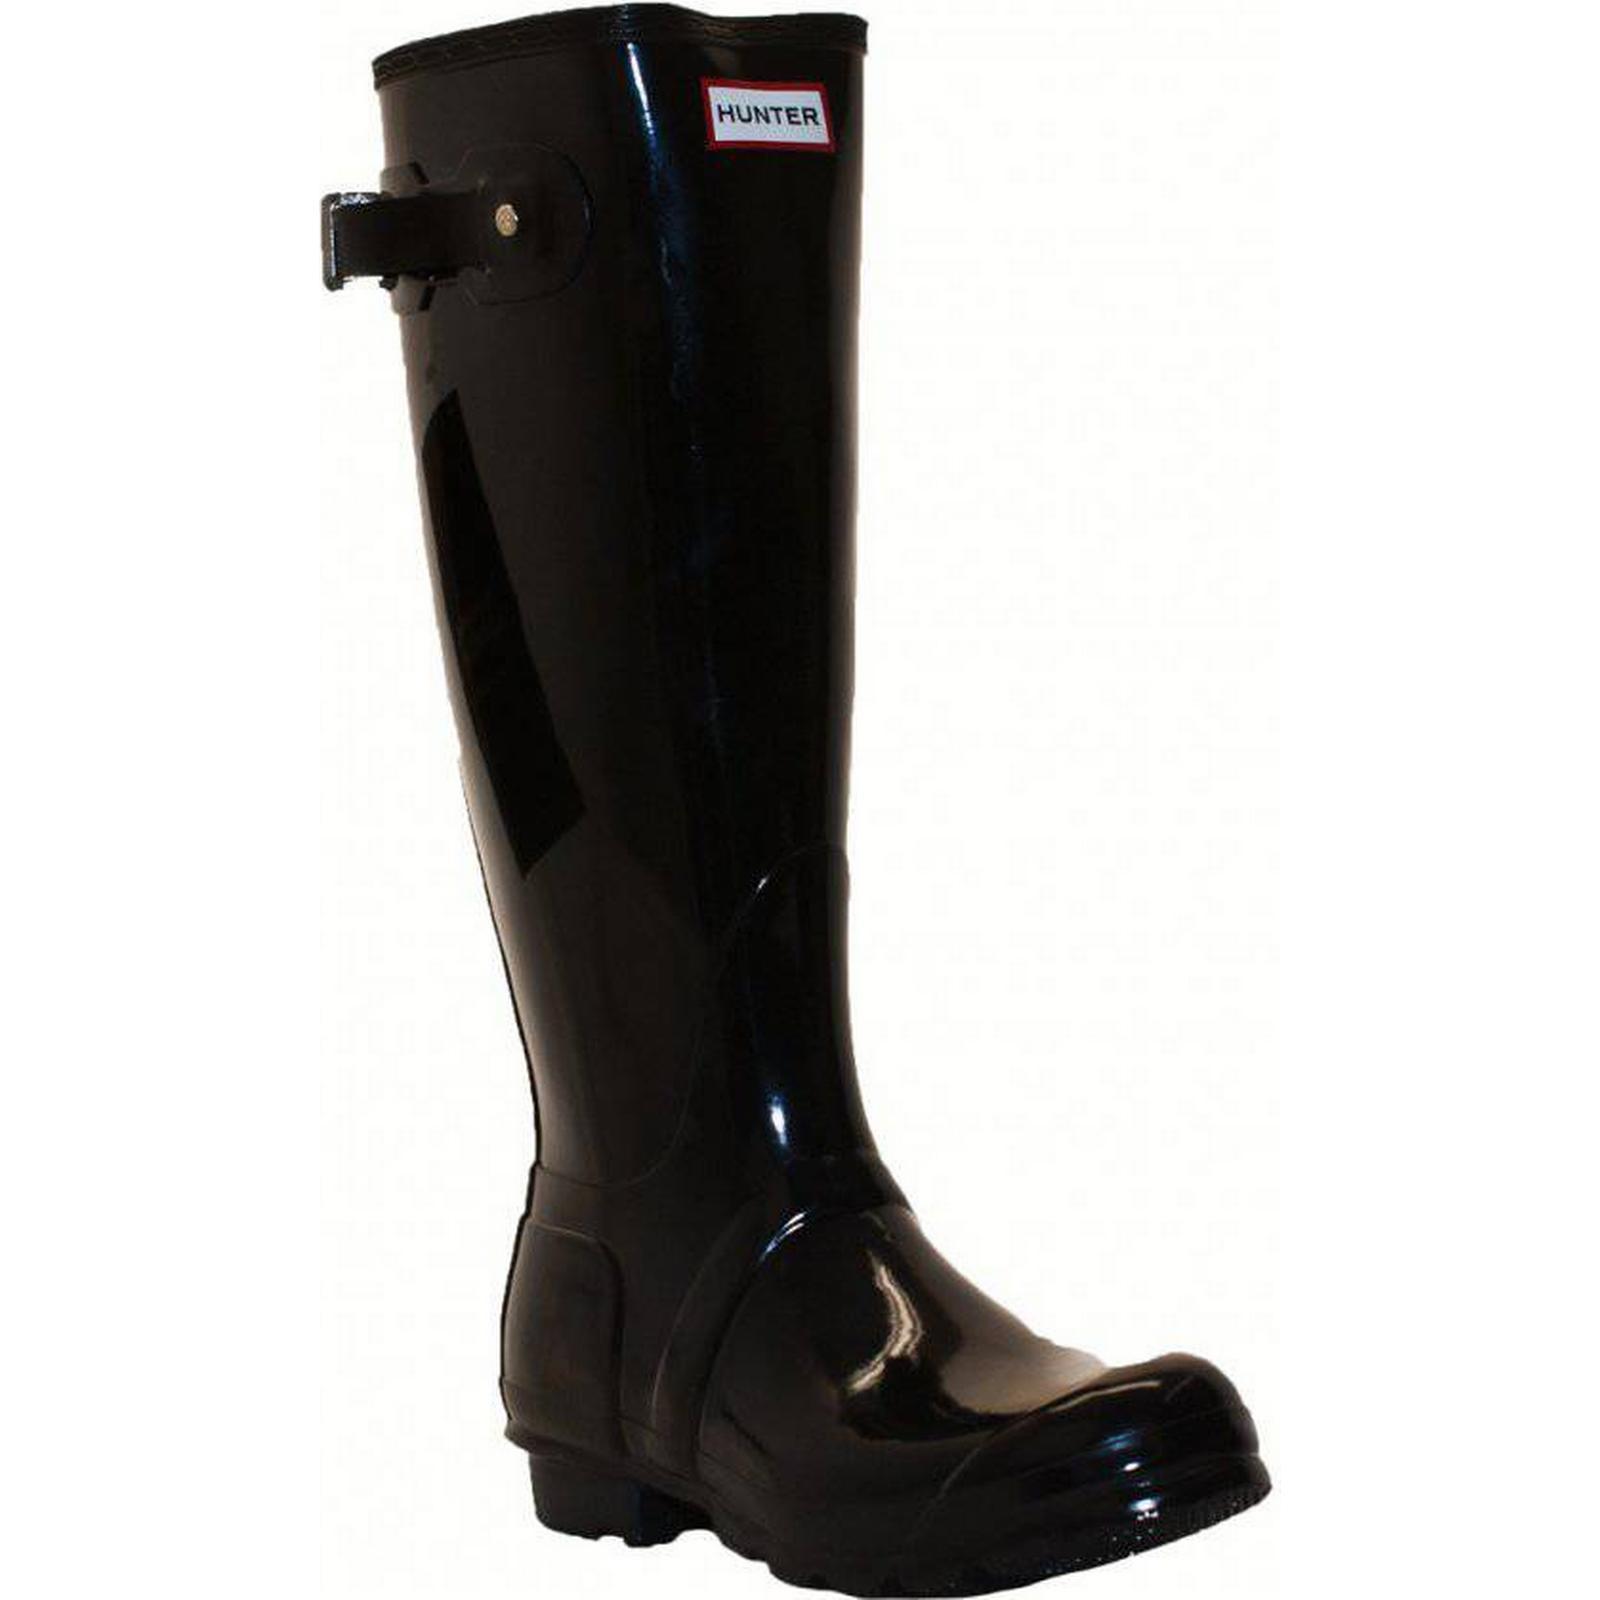 Hunter Womens (Black) Original Tall Gloss Wellington (Black) Womens Size: 5, Colour: 656bf8